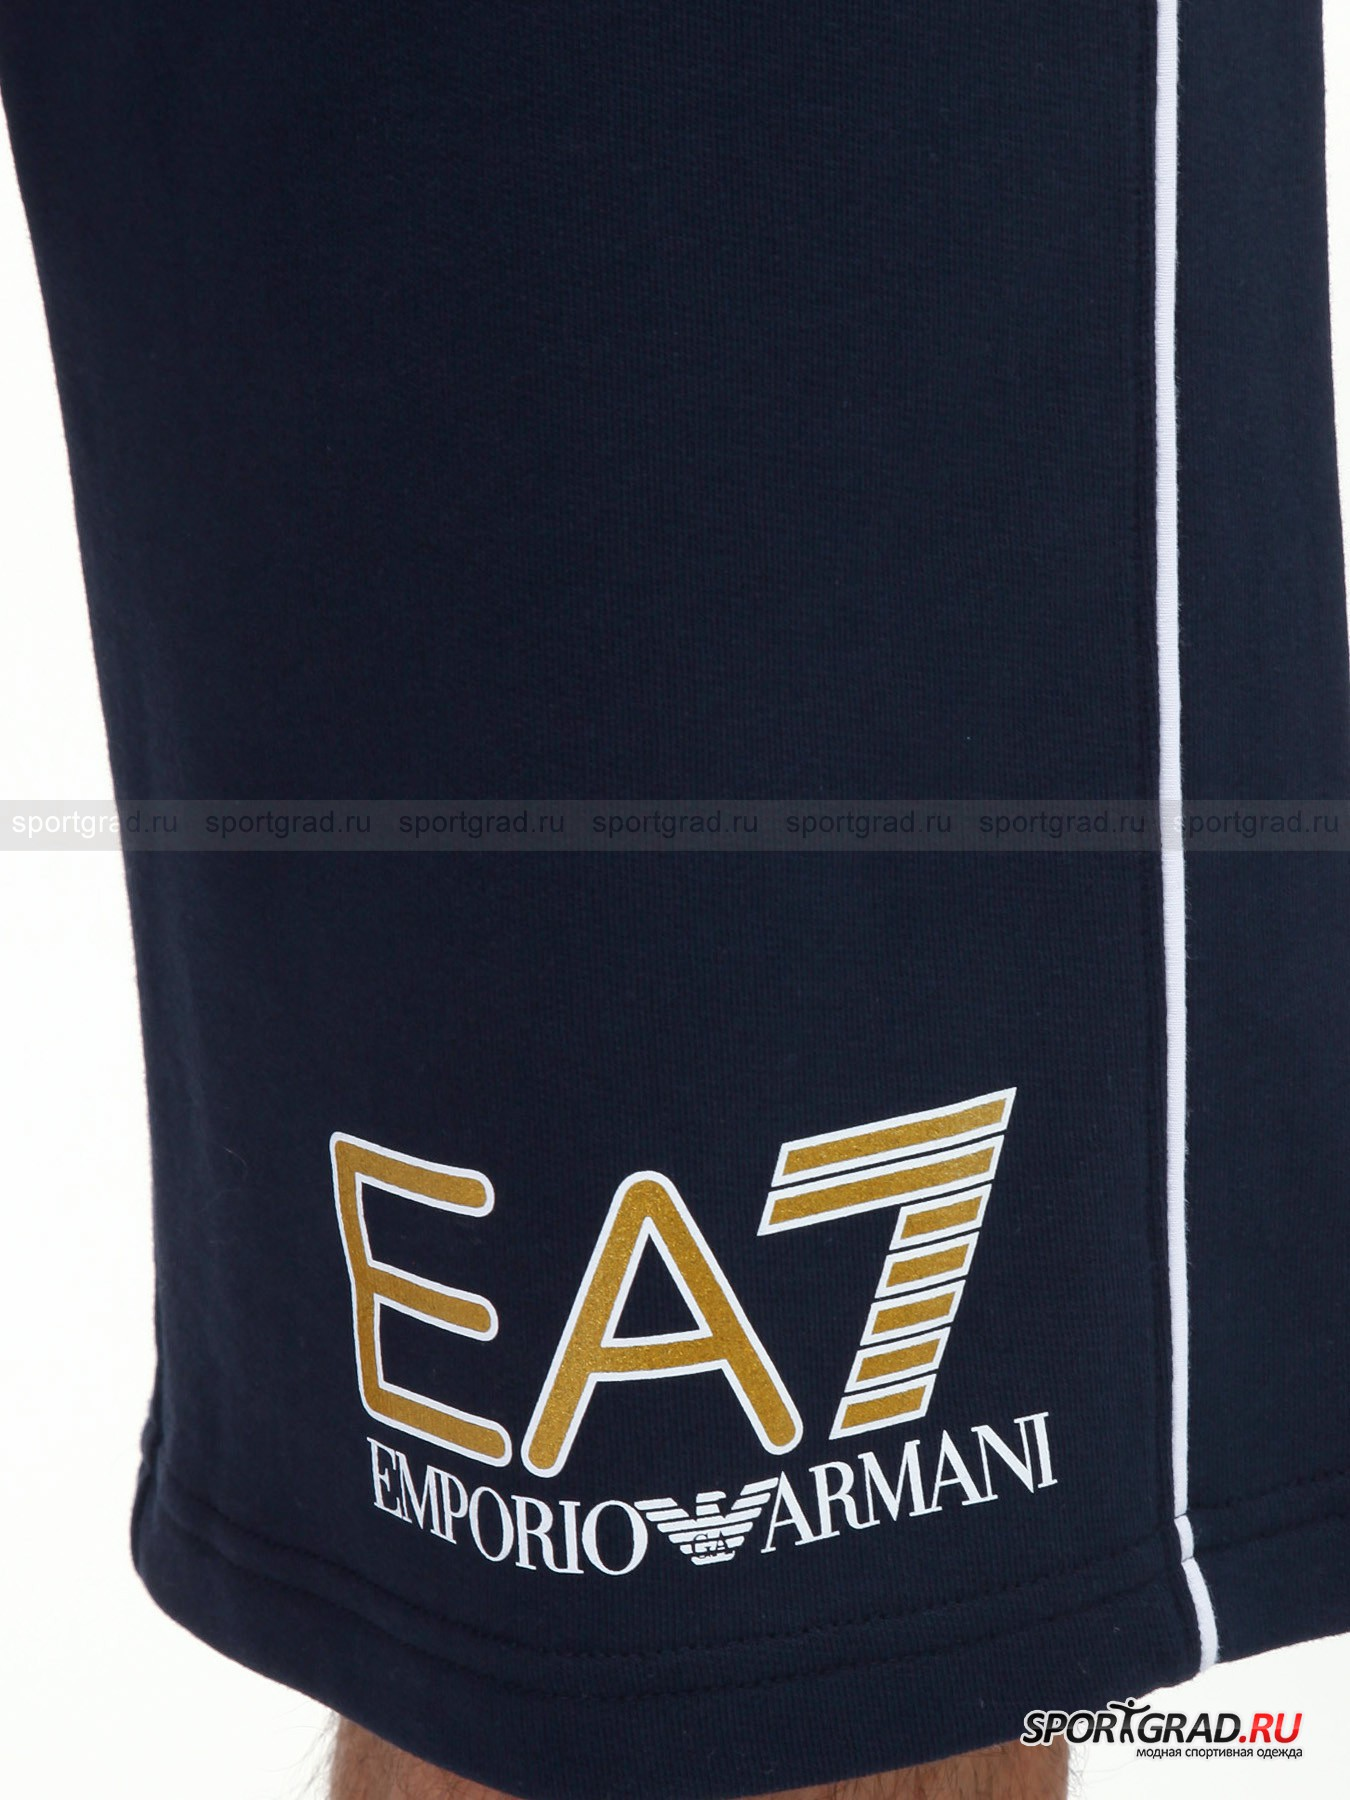 Шорты мужские EMPORIO ARMANI от Спортград